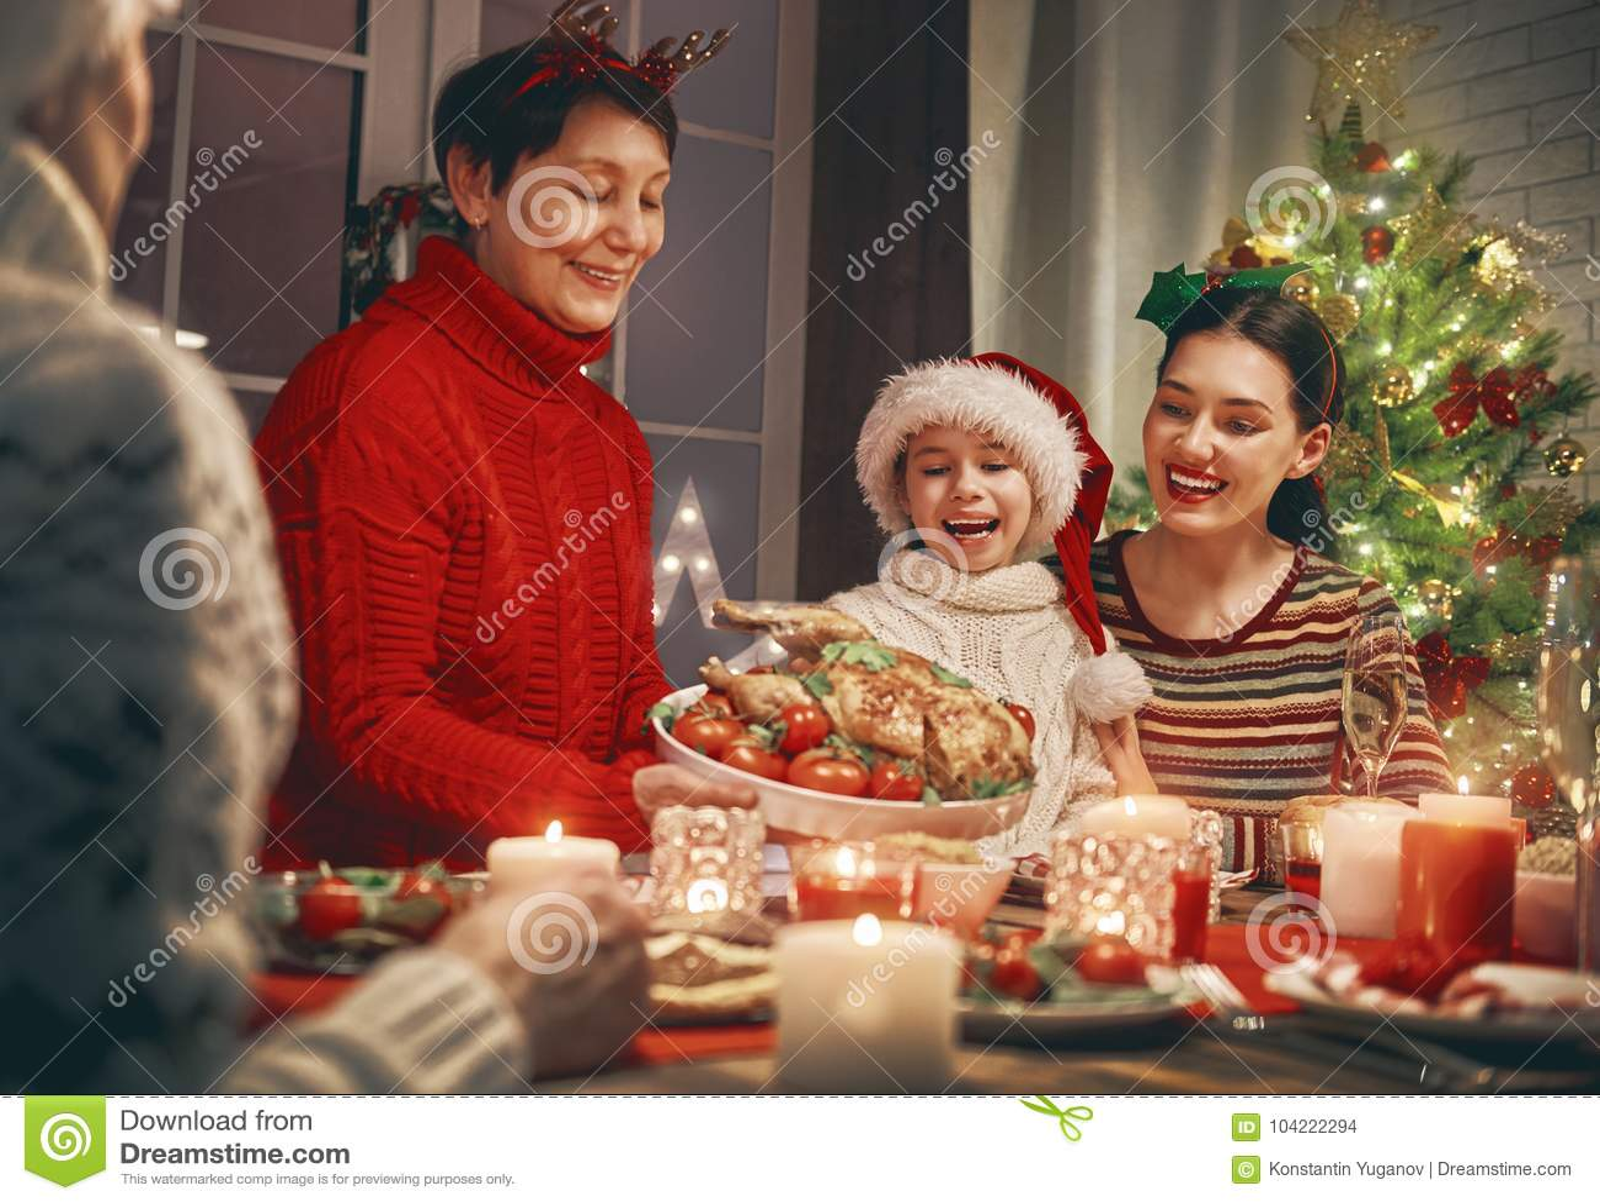 family celebrates christmas - Who Celebrates Christmas